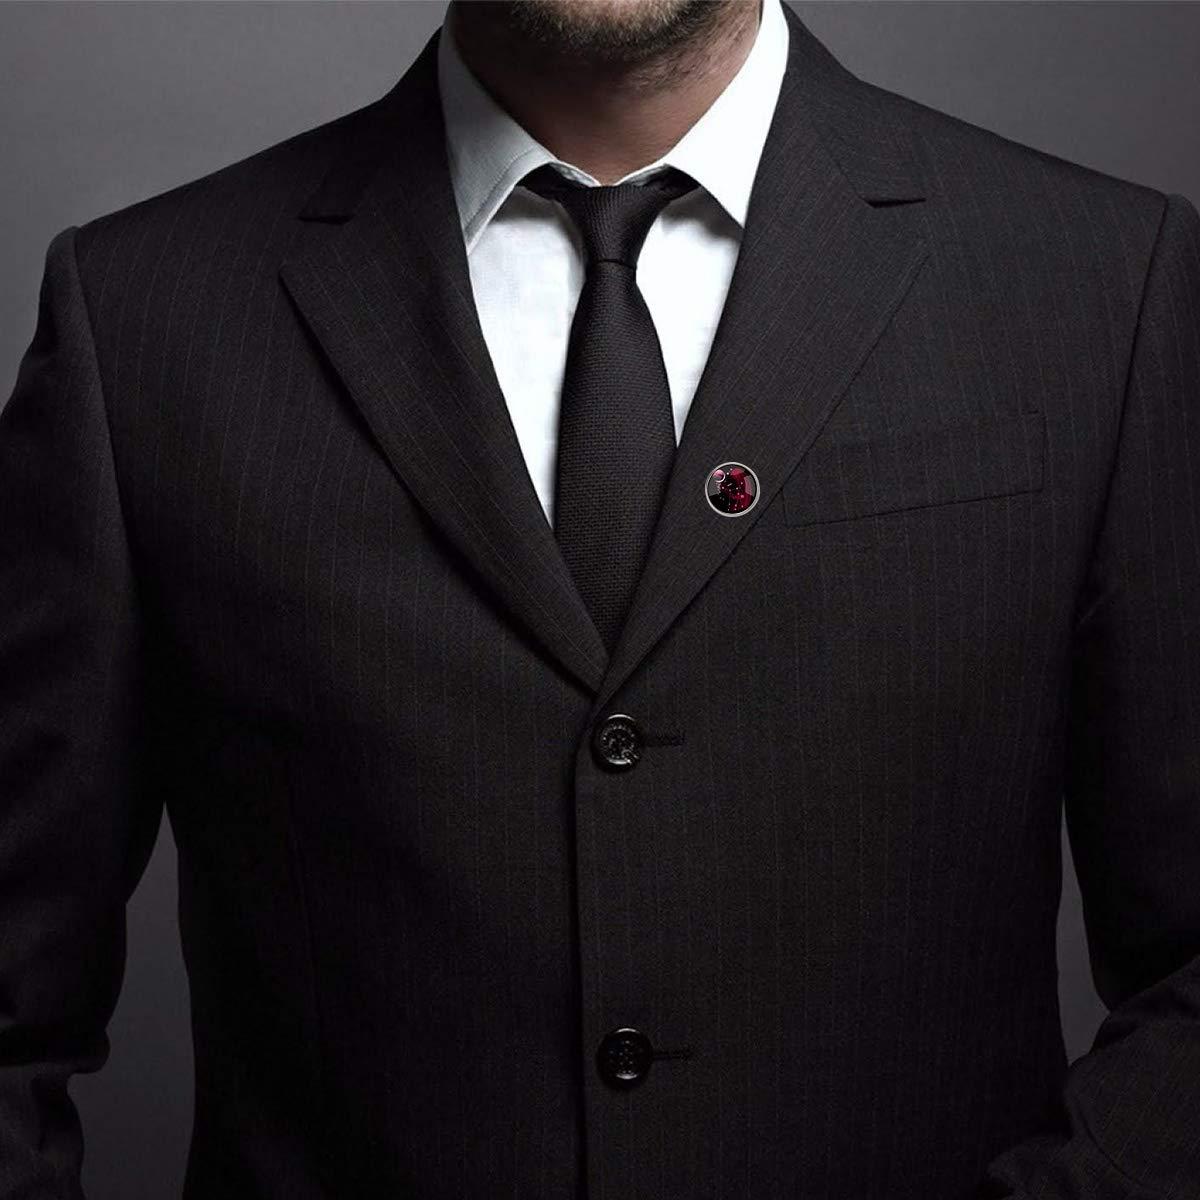 Custom Lapel Pin Brooches 12 Constellations Virgo Banquet Badge Pins Trendy Accessory Jacket T-Shirt Bag Hat Shoe